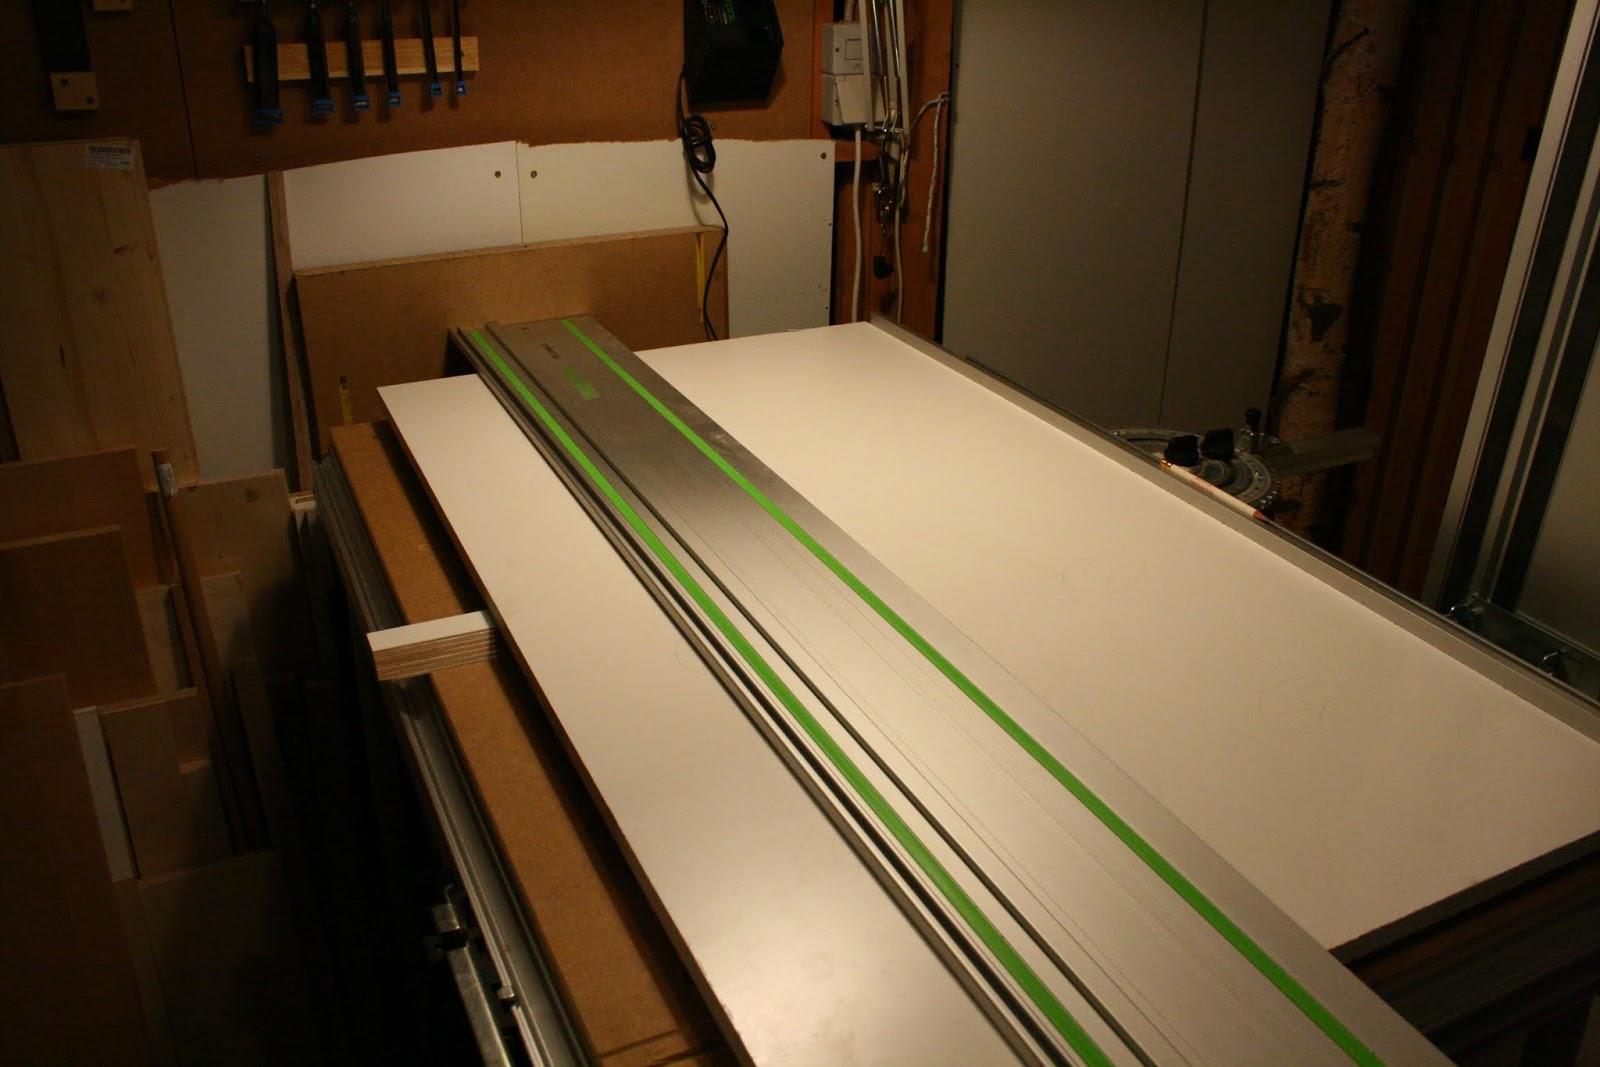 Dominiks Holzblog: Sideboard Teil 1